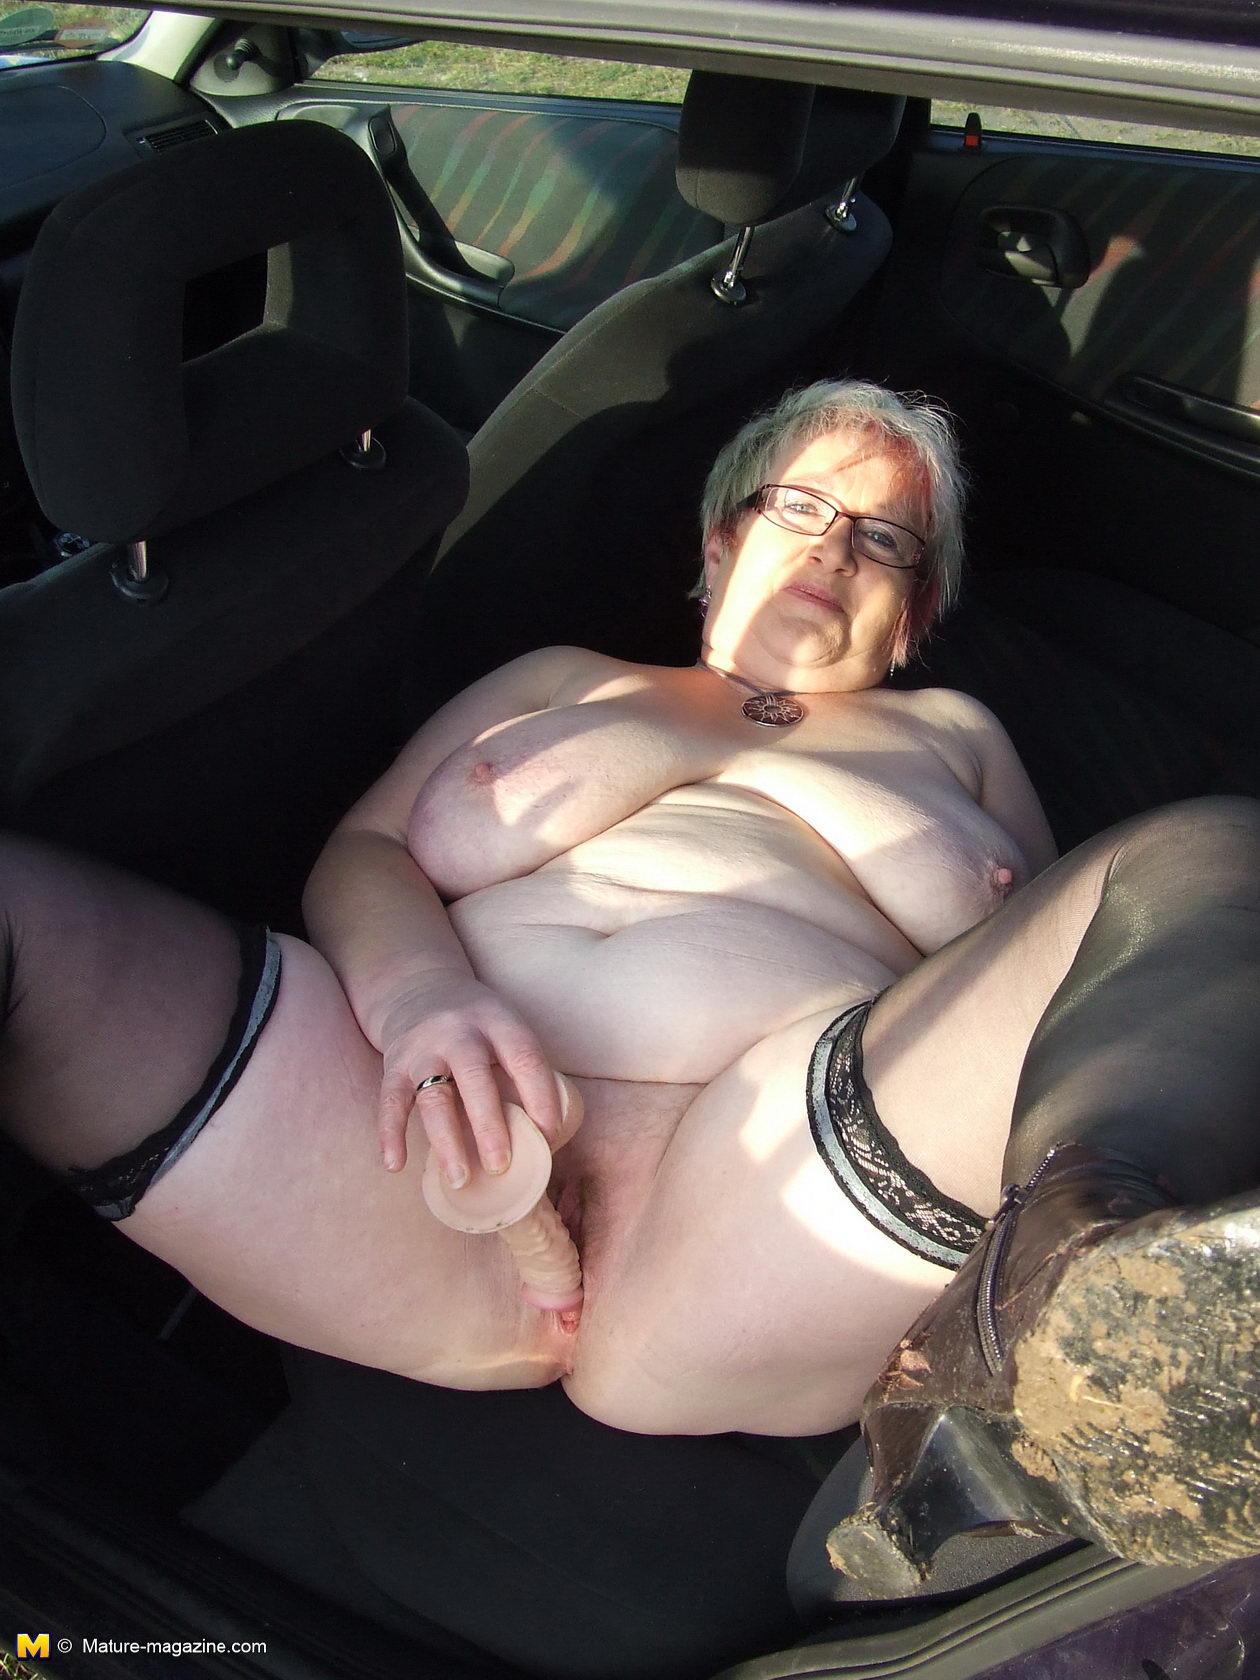 Granny public outdoor photo